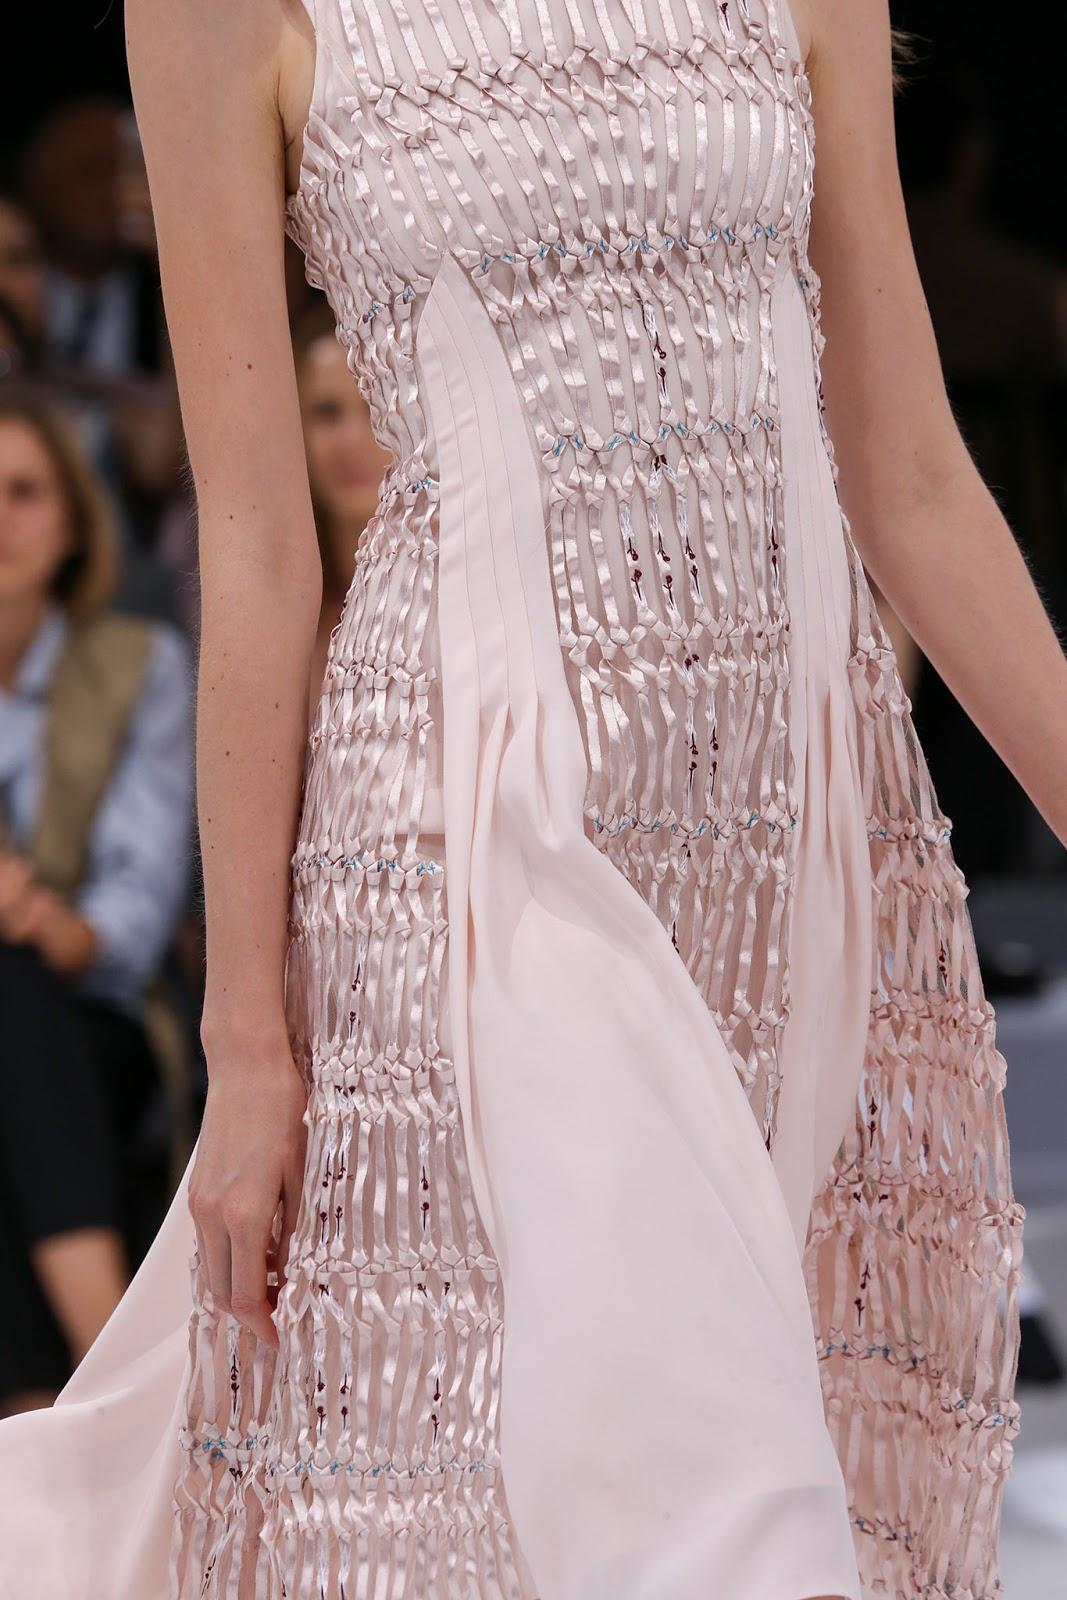 Christian Dior Spring/Summer 2015